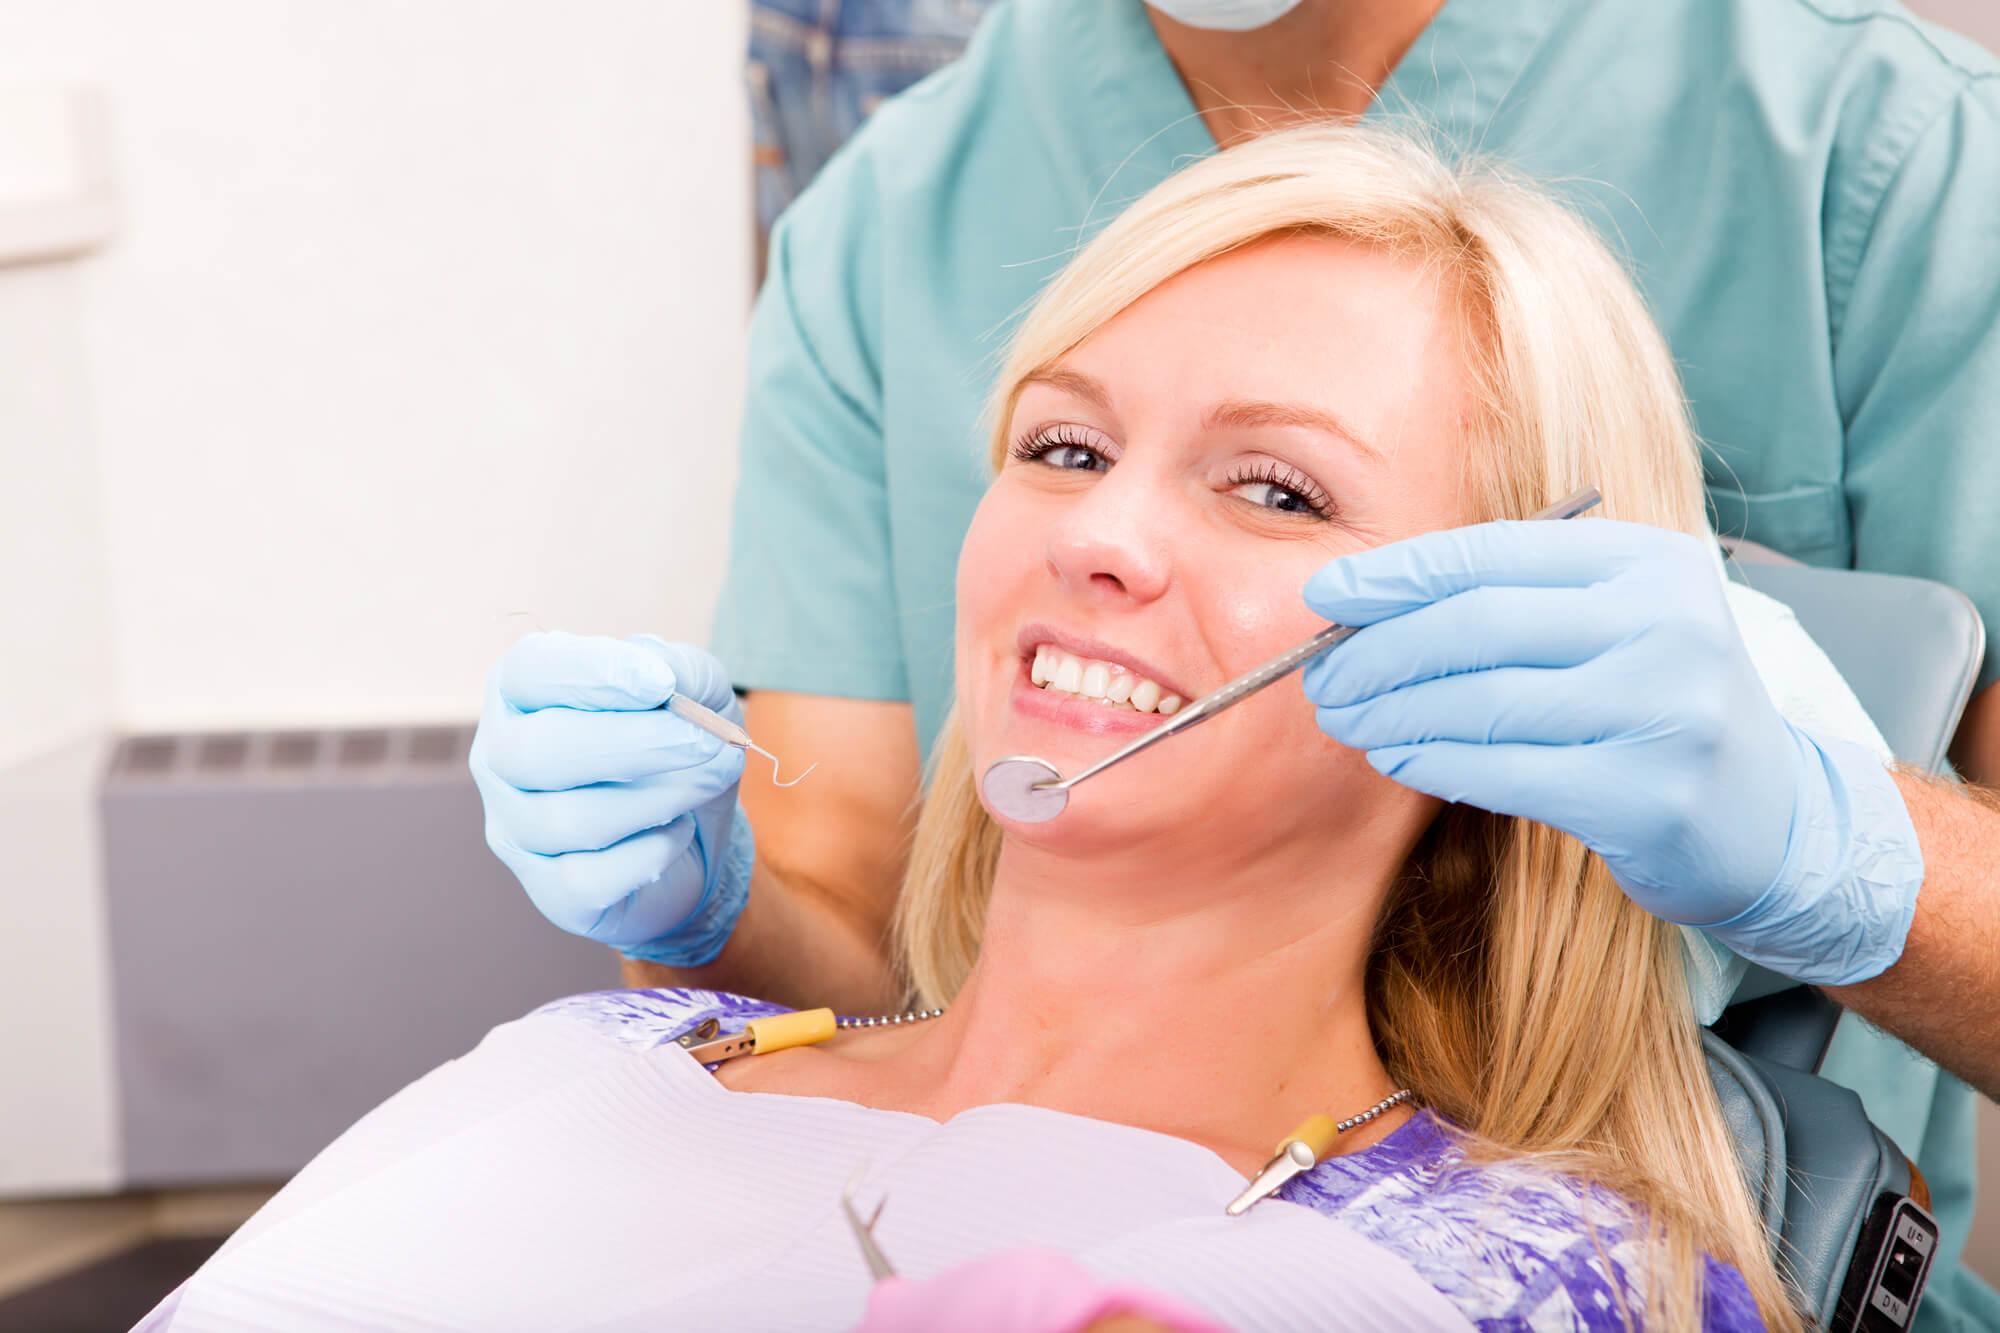 who can help me get the best dentist boynton beach?